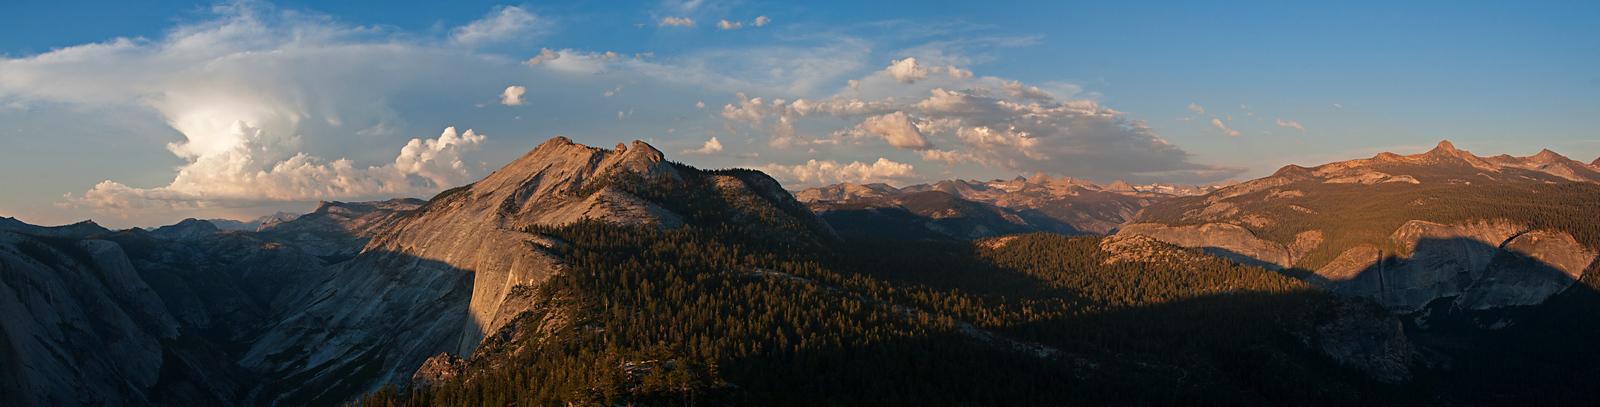 IMAGE: https://photos.smugmug.com/Hobbies/JMT-2013-Tuolomne-to-Yosemite/i-fCPgBKb/0/2707bacc/X3/East%20from%20Half%20Dome-X3.jpg